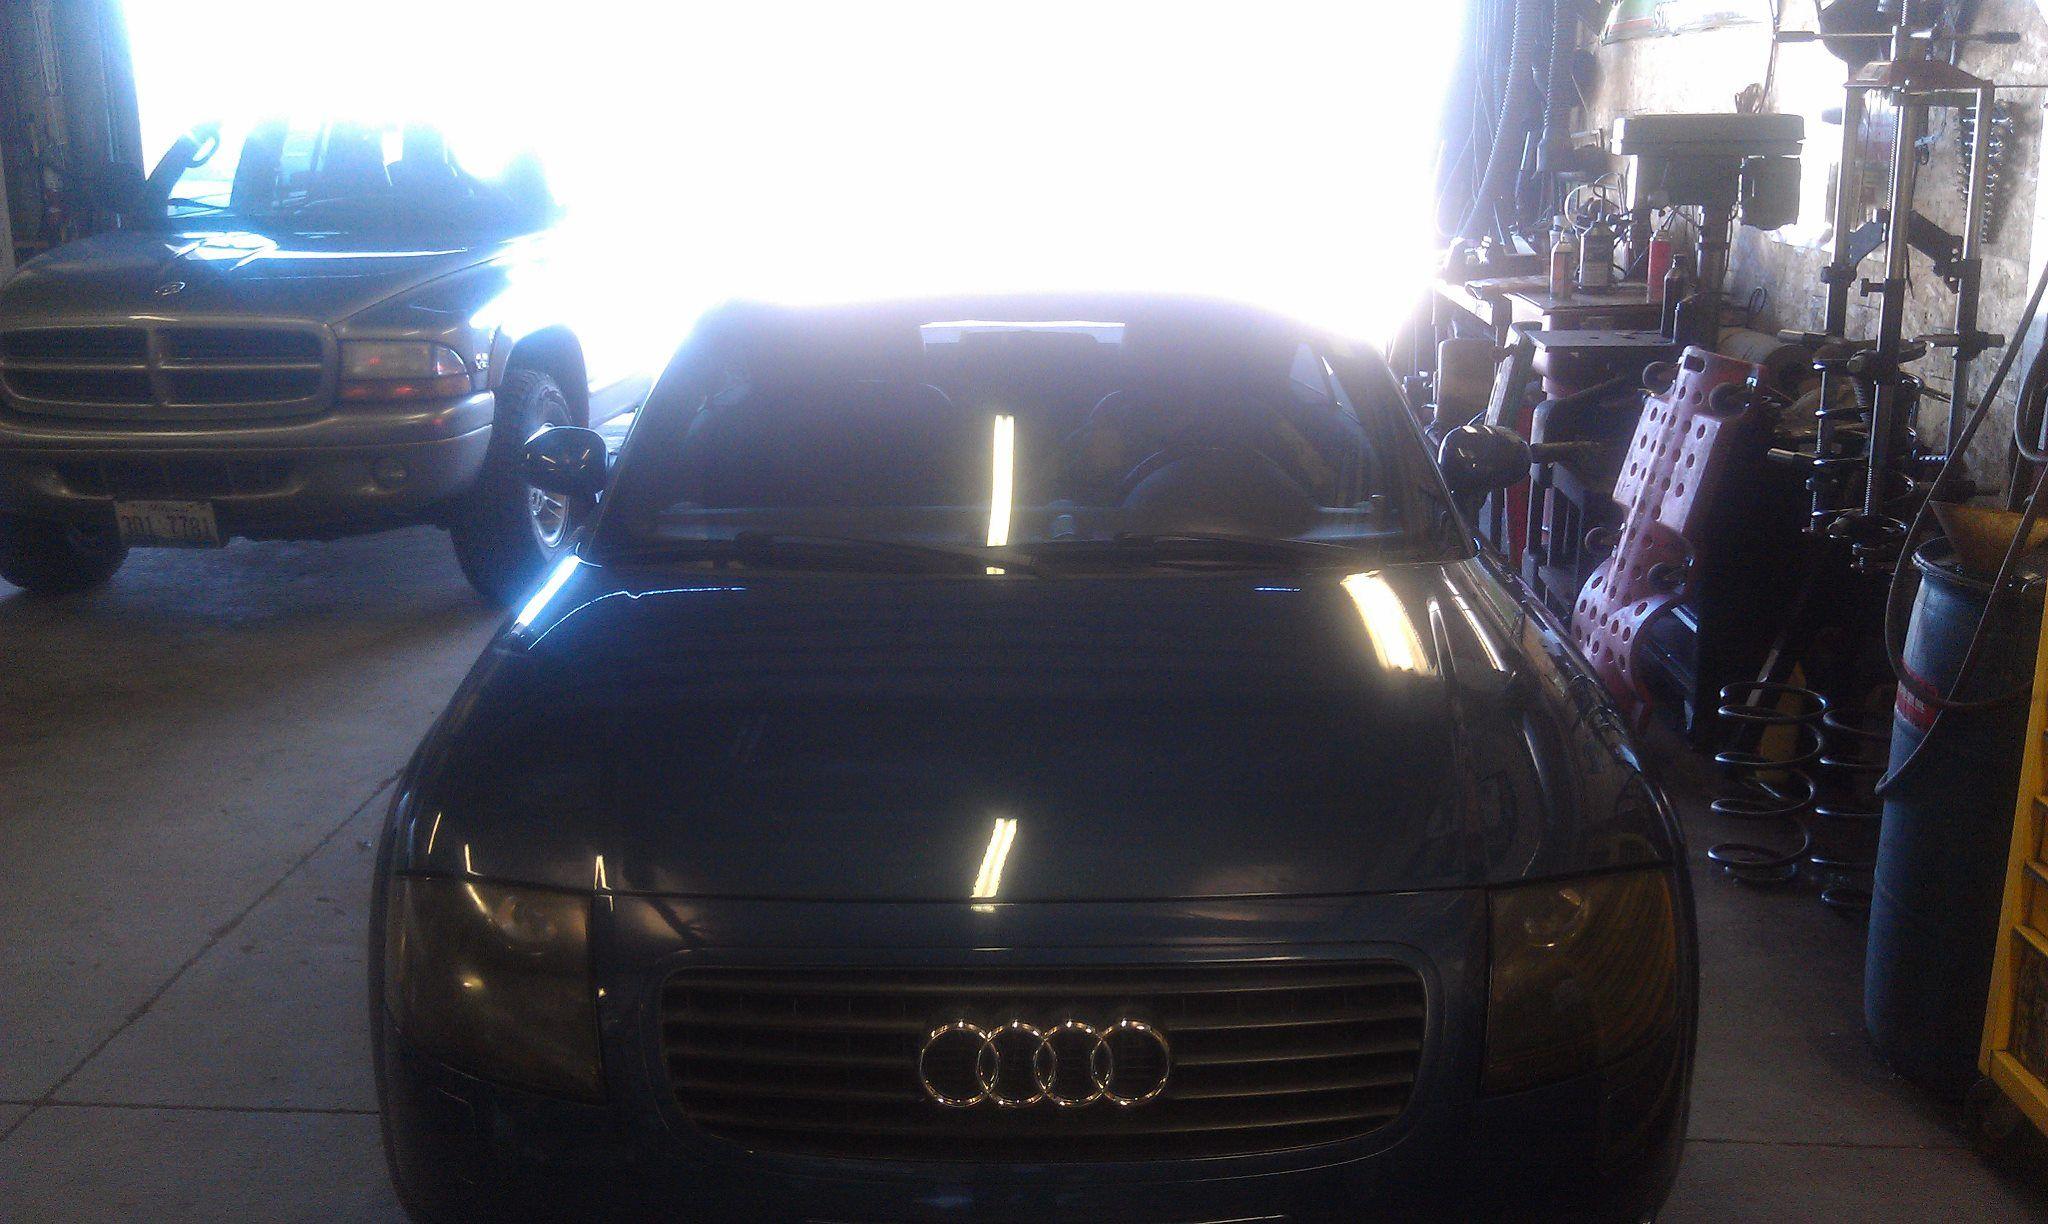 European Auto Repair Plainfield Naperville Bolingbrook Il